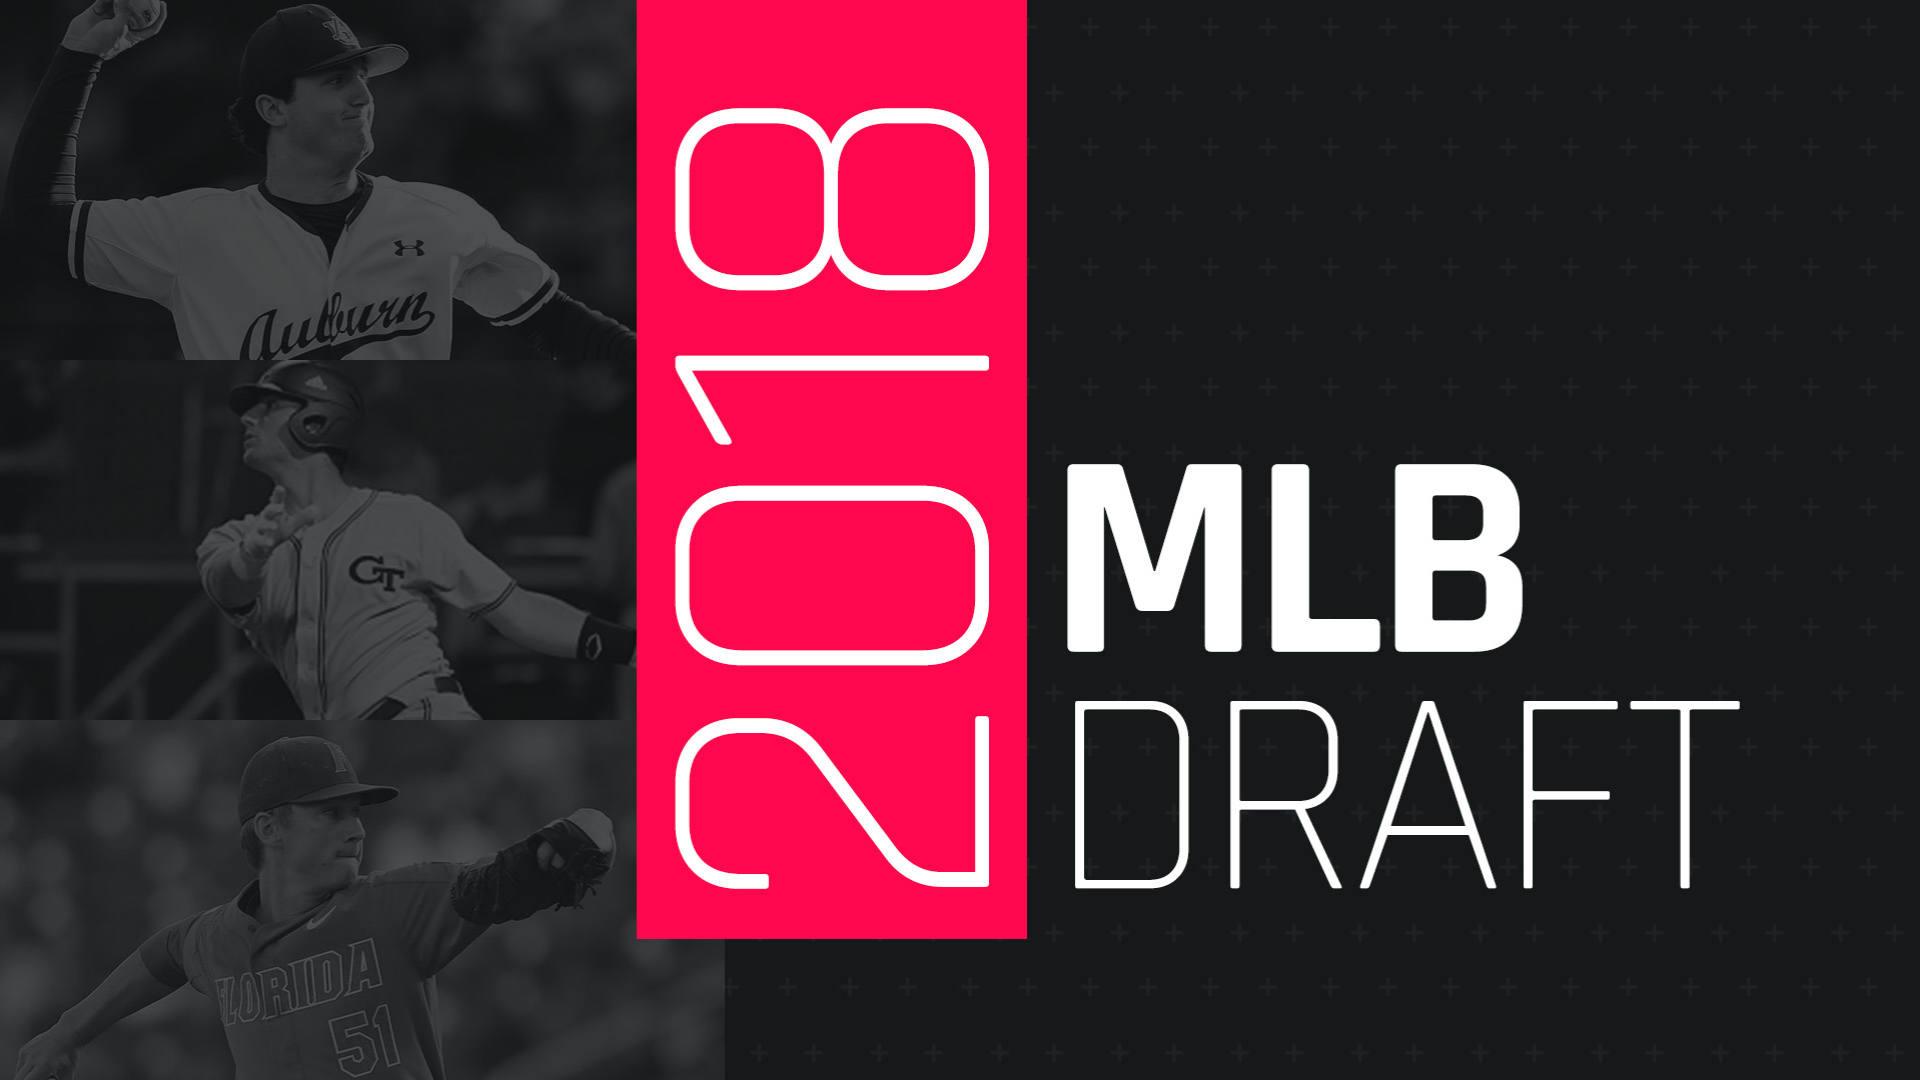 2018_MLB_Draft_060418_FTR.jpg